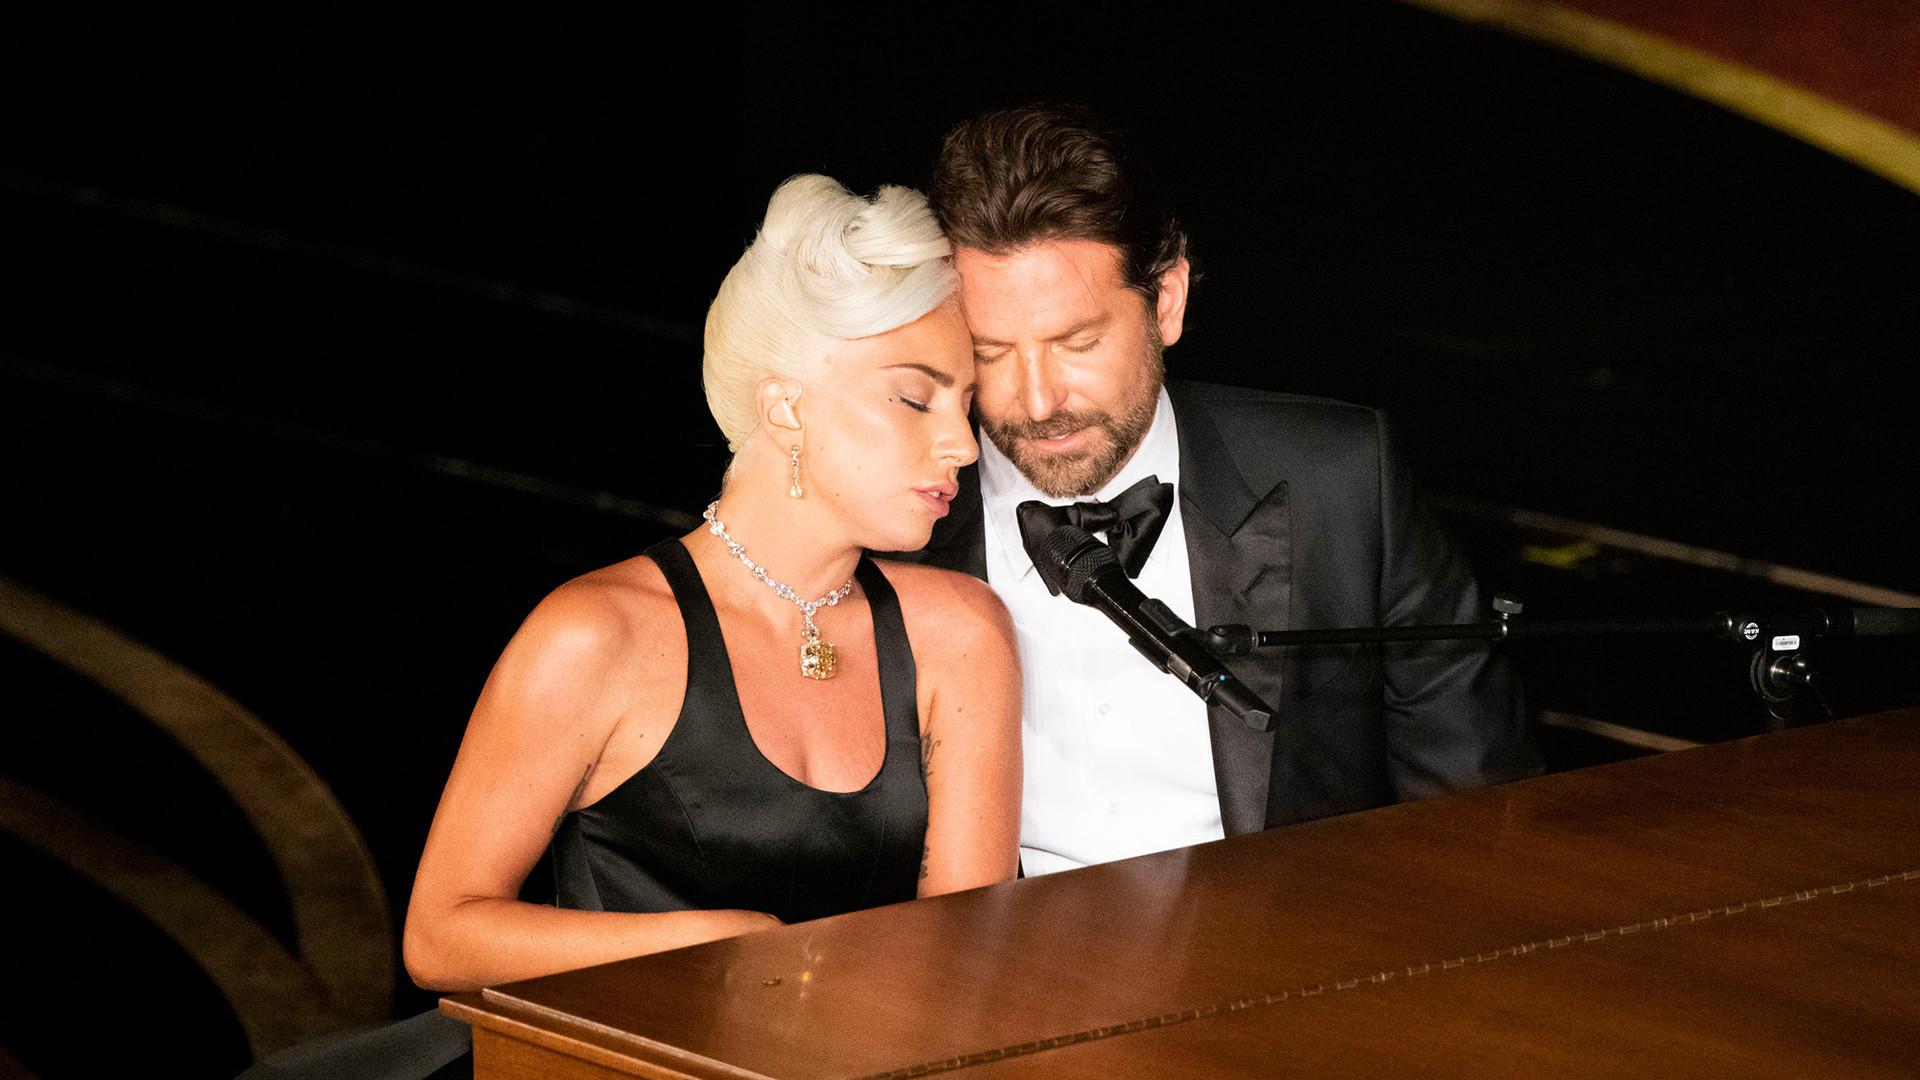 Lady Gaga Responds to Claim She Stole 'Shallow' - Grazia